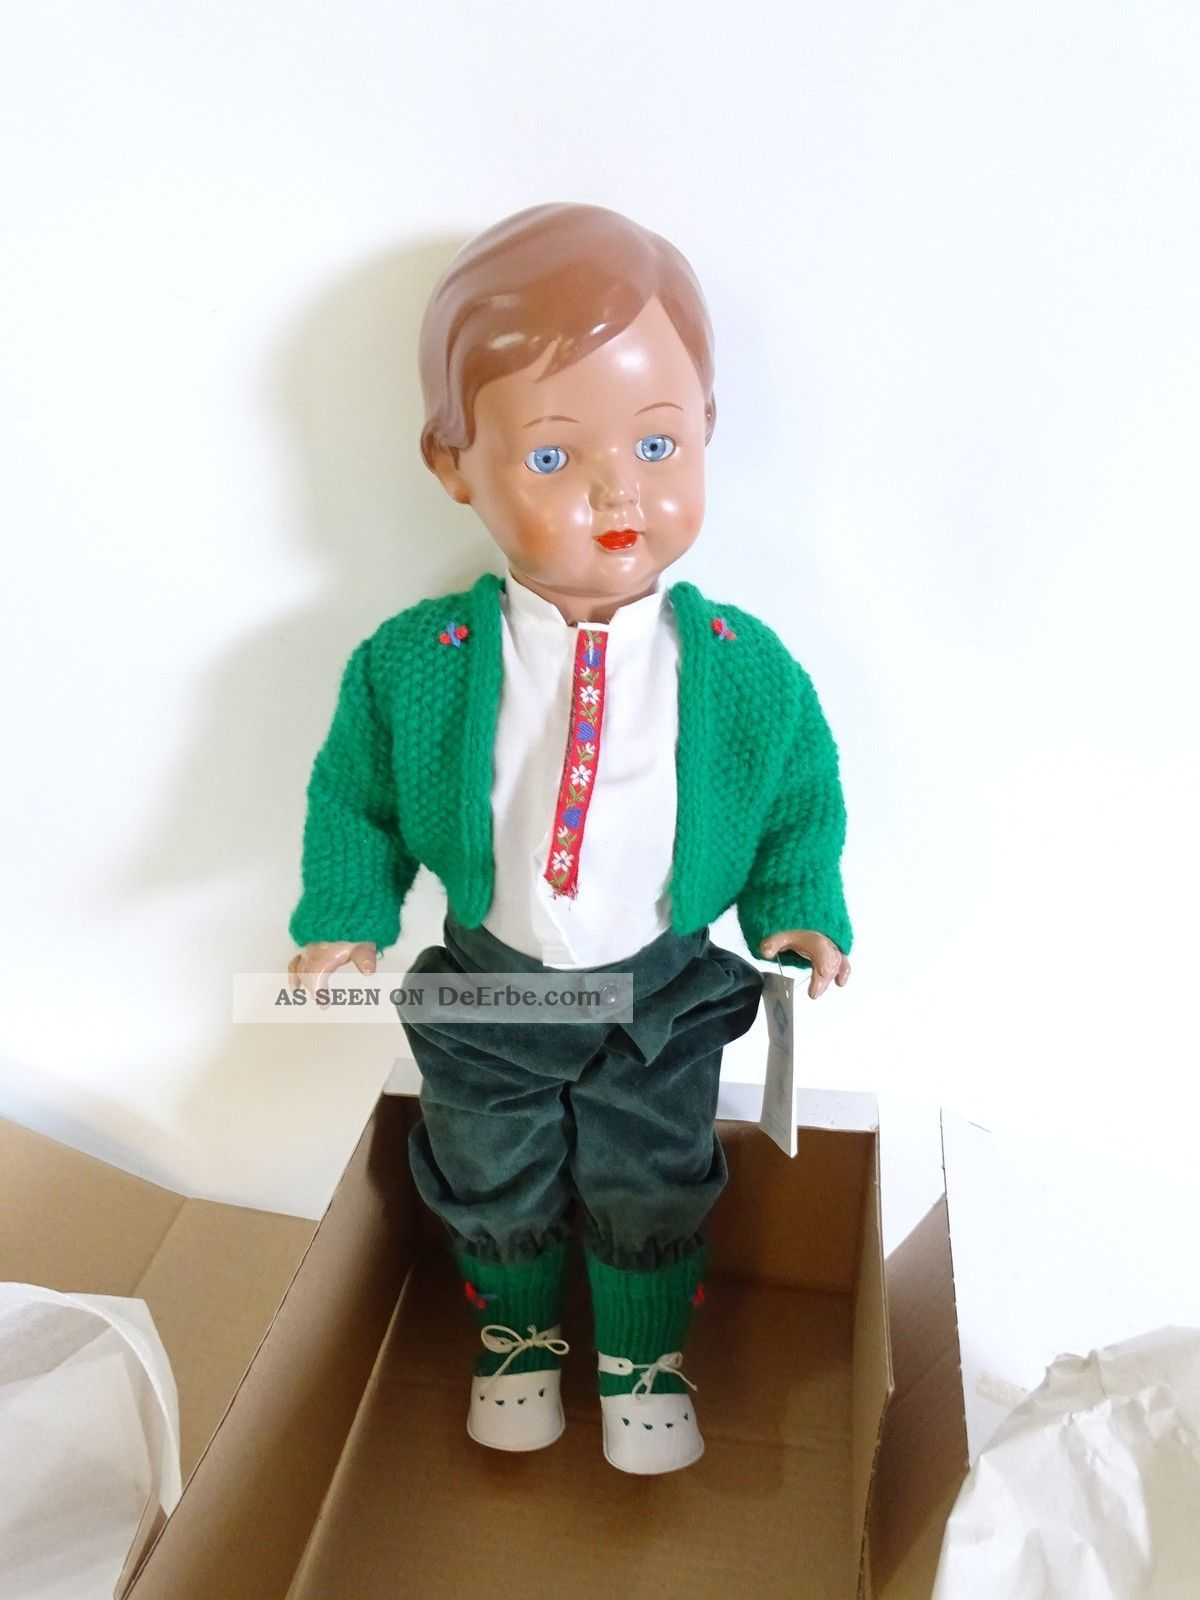 Alte Schildkröt Puppe Rep 56 Inkl.  Grüner Kleidung Und Schildkröt Ovp Schildkröt Bild